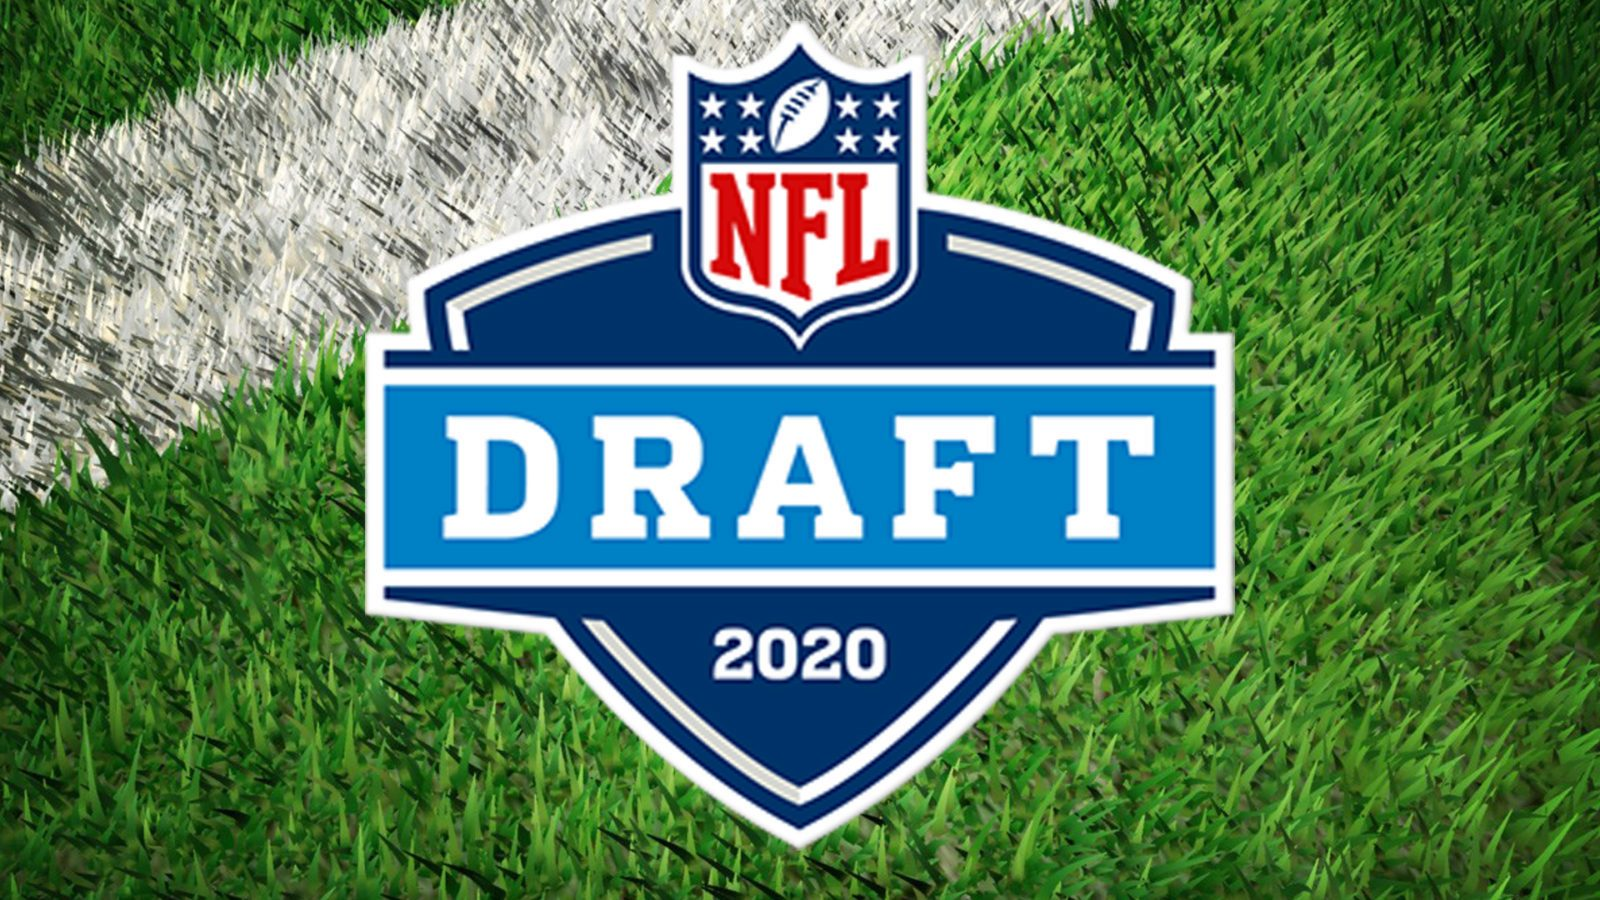 Tre domande sul Draft 2020 NFL